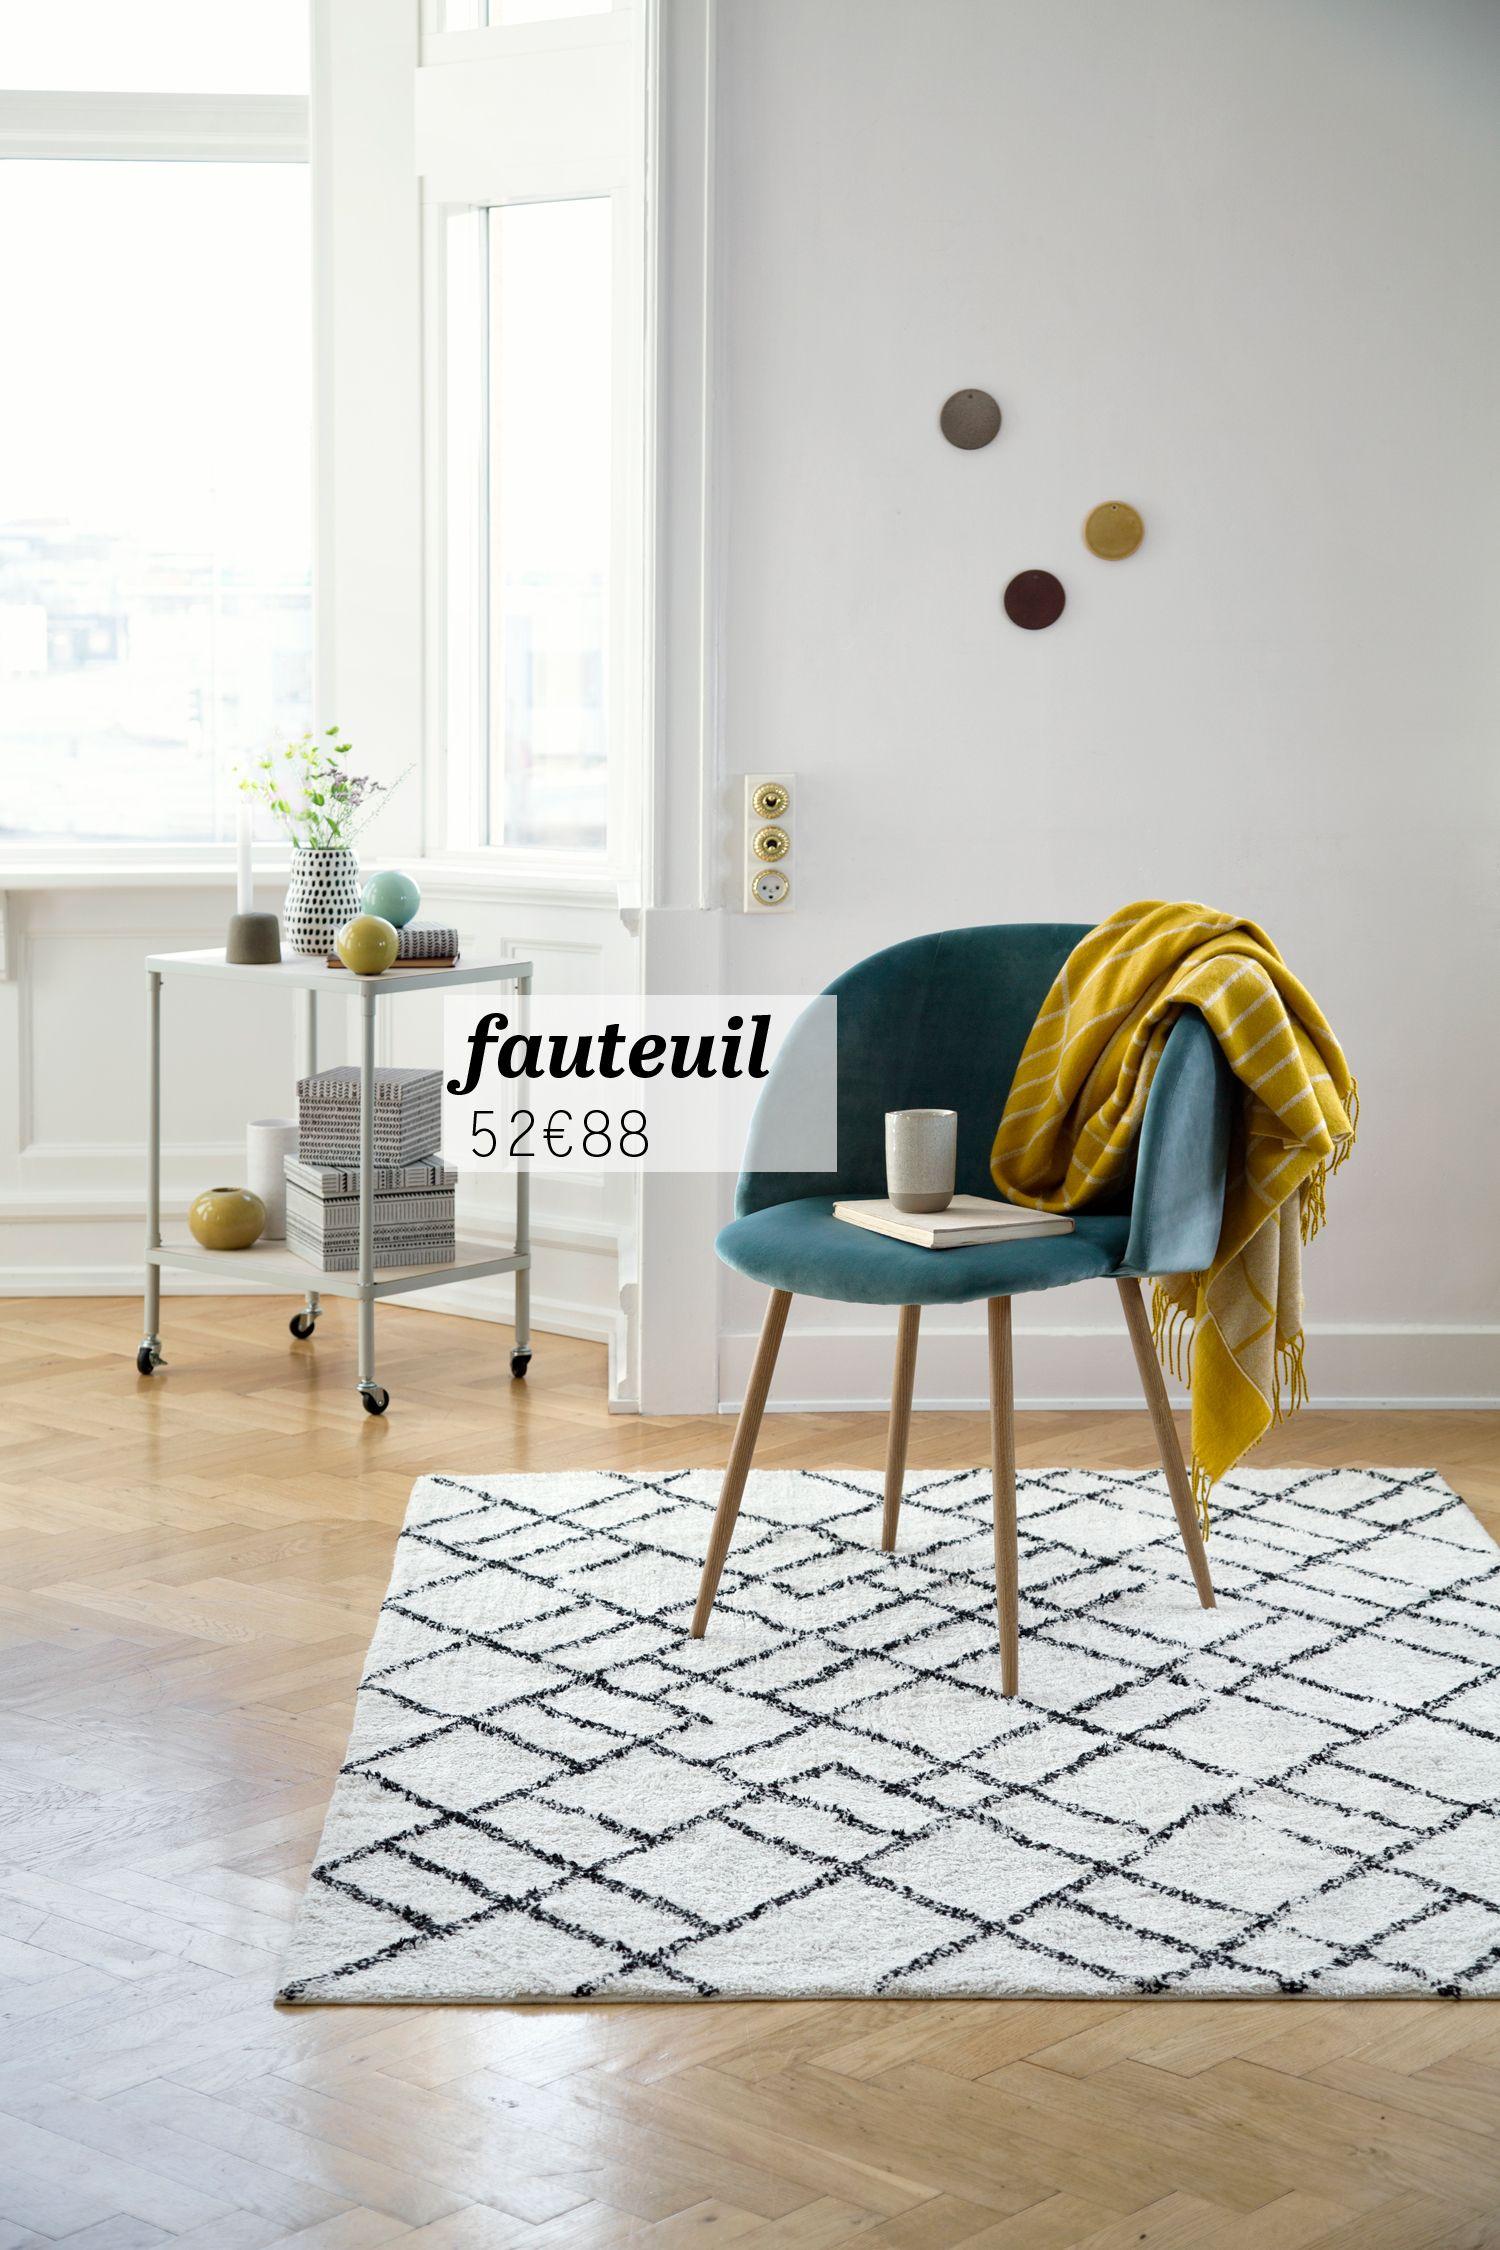 sostrene grene d barque enfin paris lovely flat pinterest. Black Bedroom Furniture Sets. Home Design Ideas